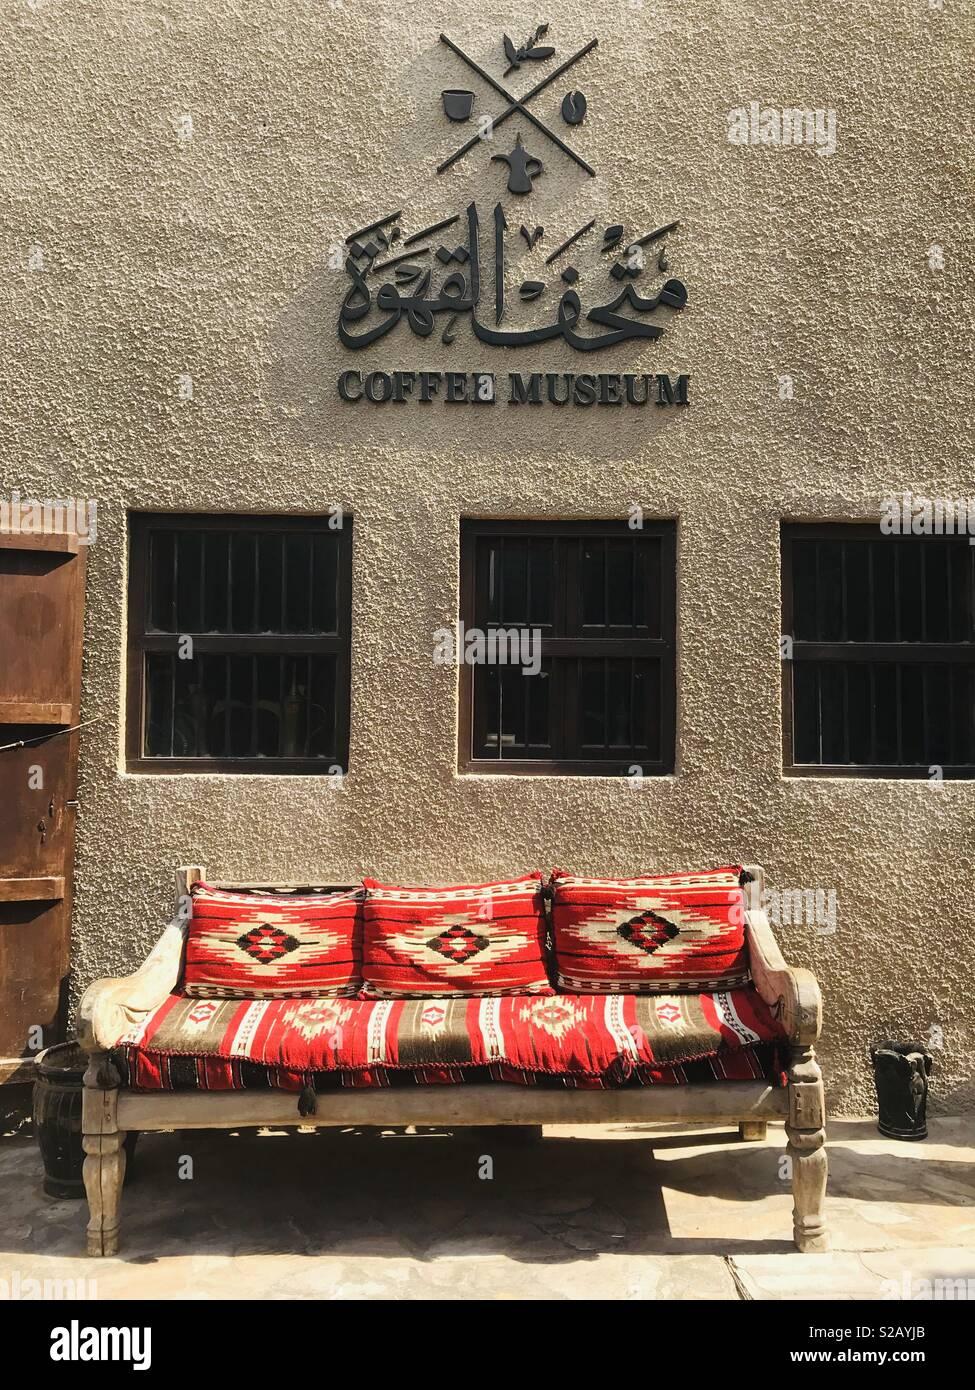 Coffee museum back streets of Dubai - Stock Image